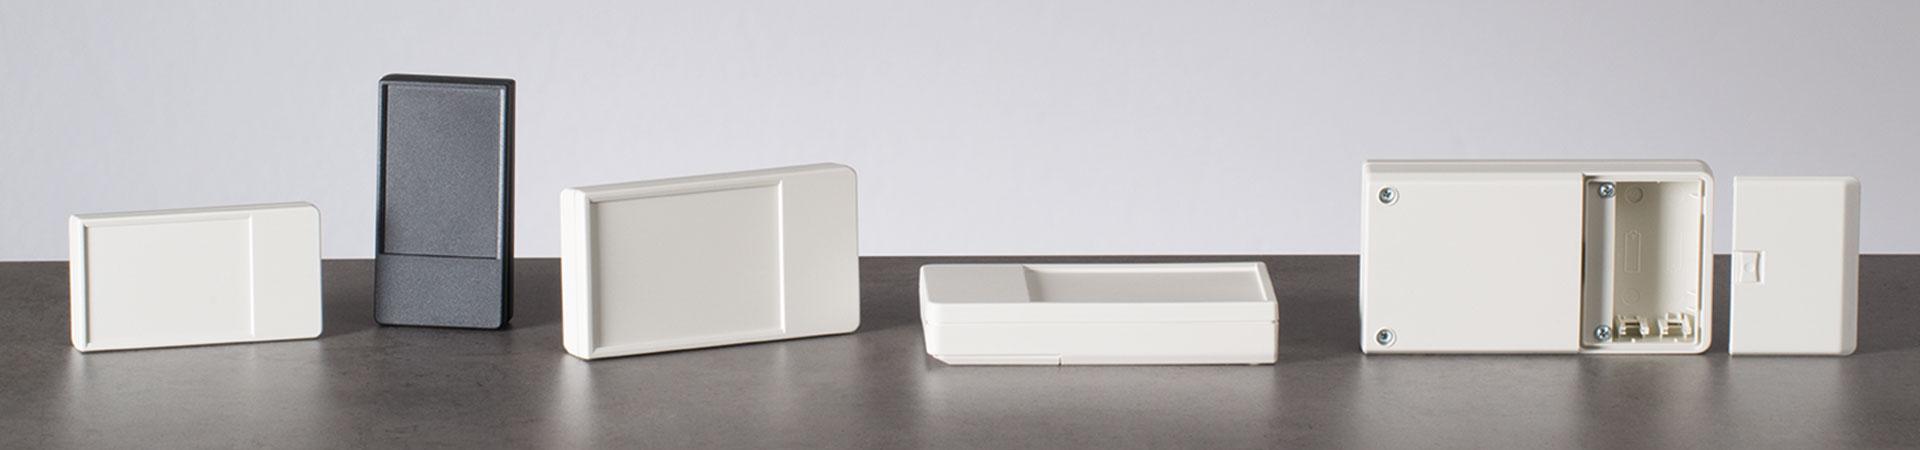 DATEC-POCKET-BOX